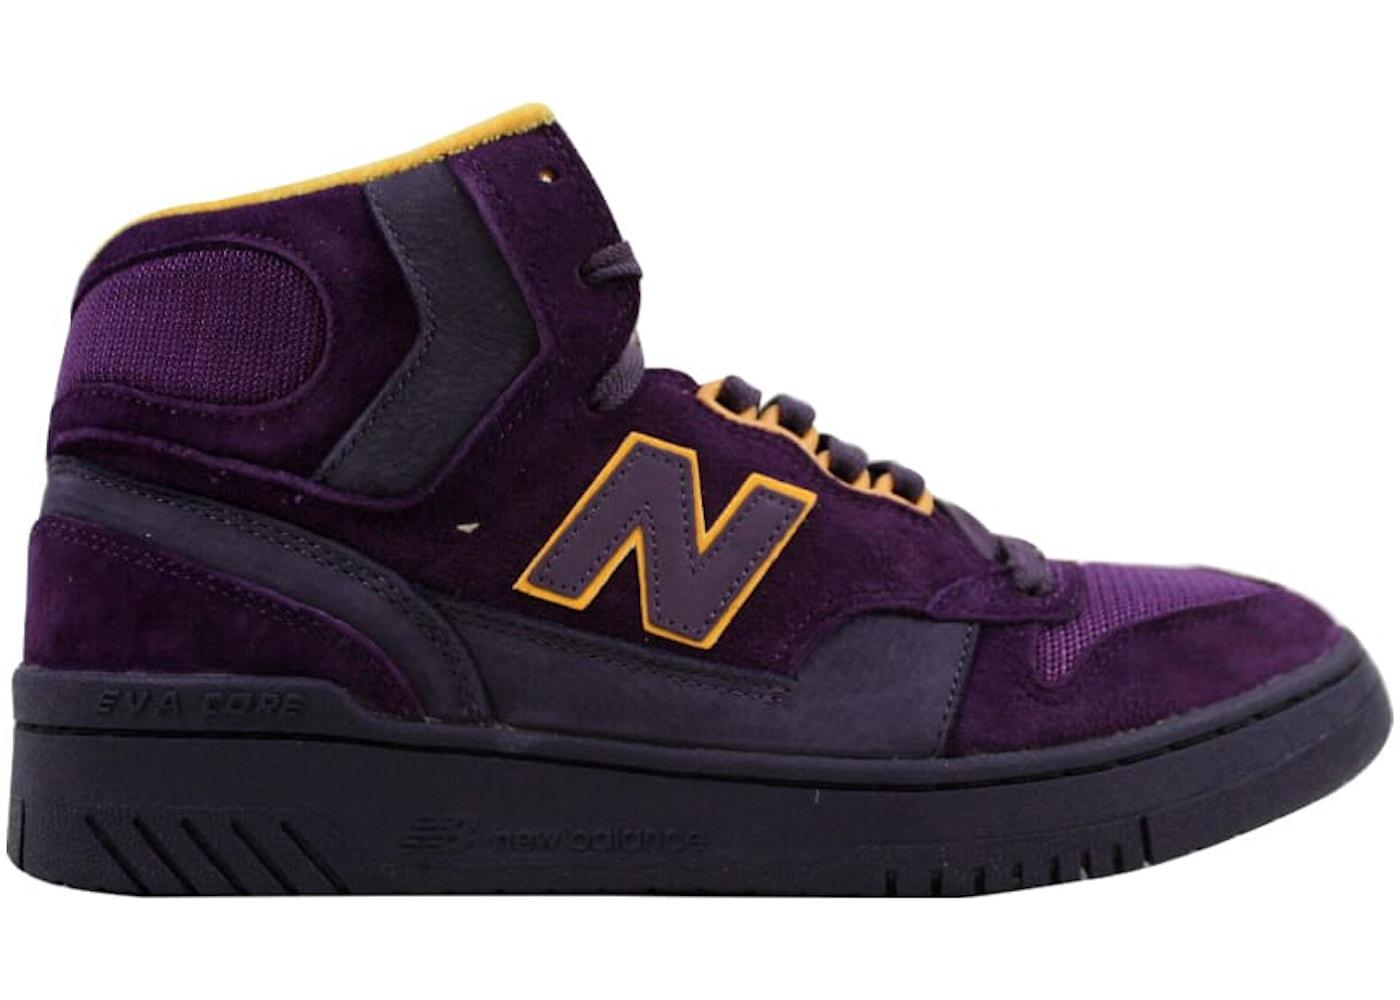 9a463a663ce9 New Balance Packer Shoes P740 James Worthy - P740PPR